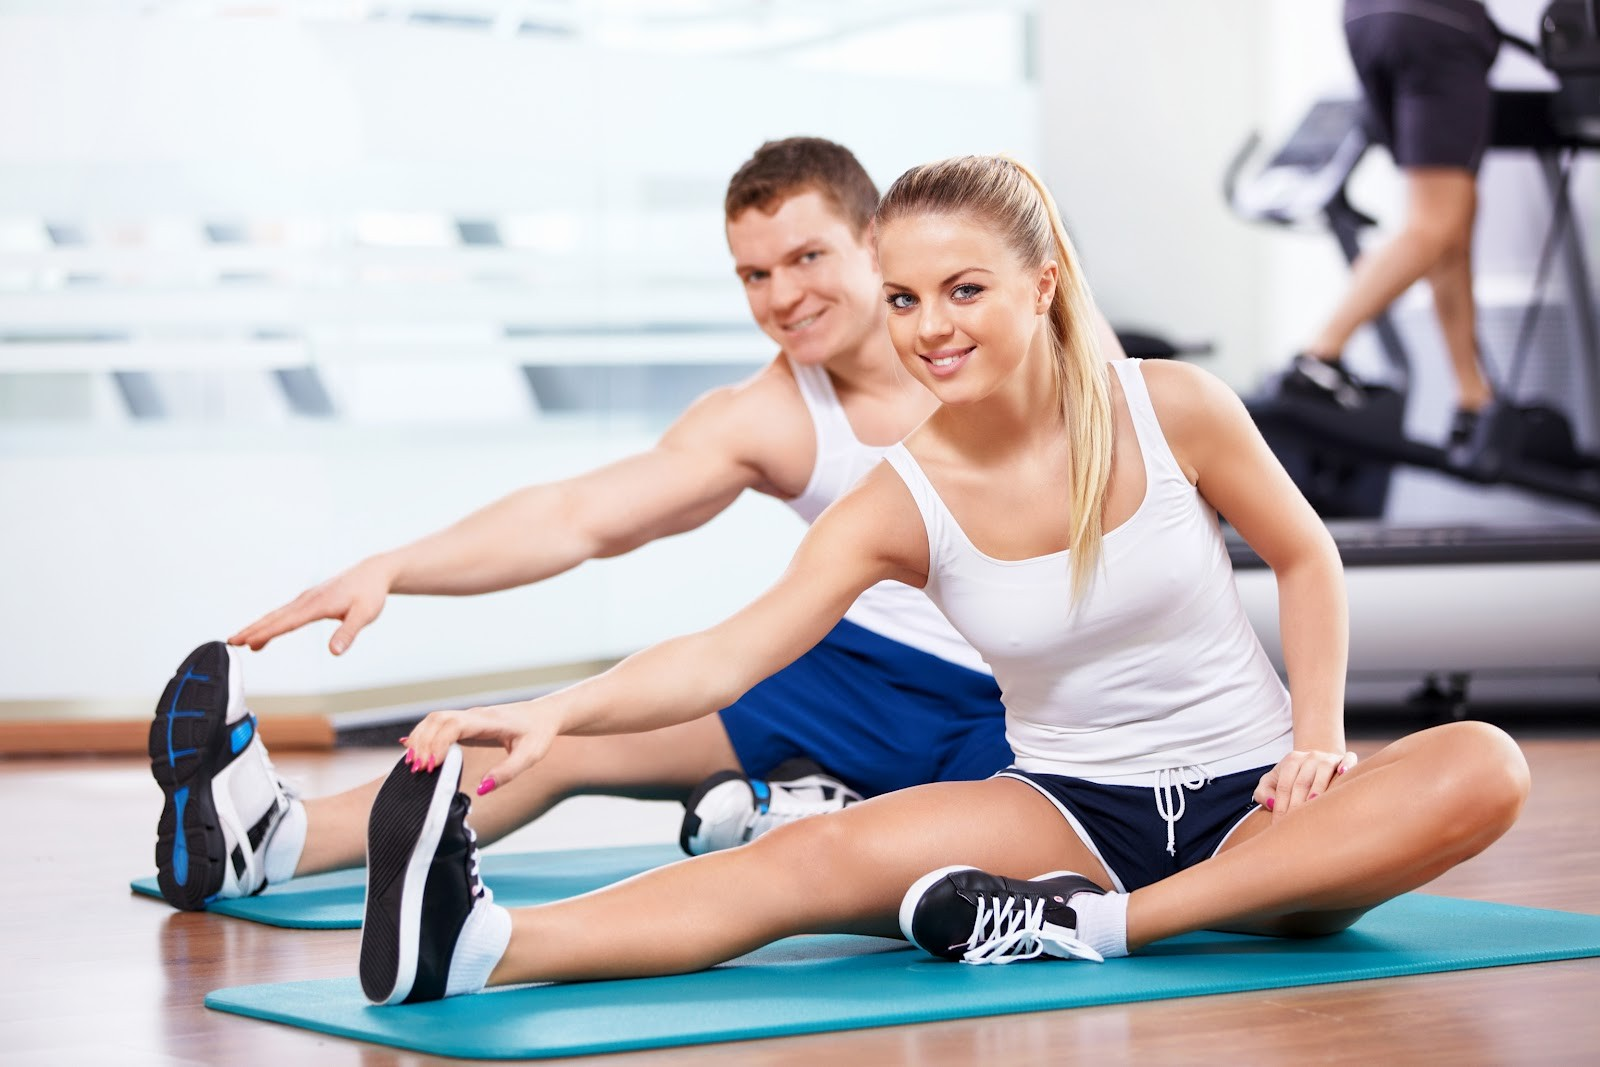 Упражнения на осанку без предметов